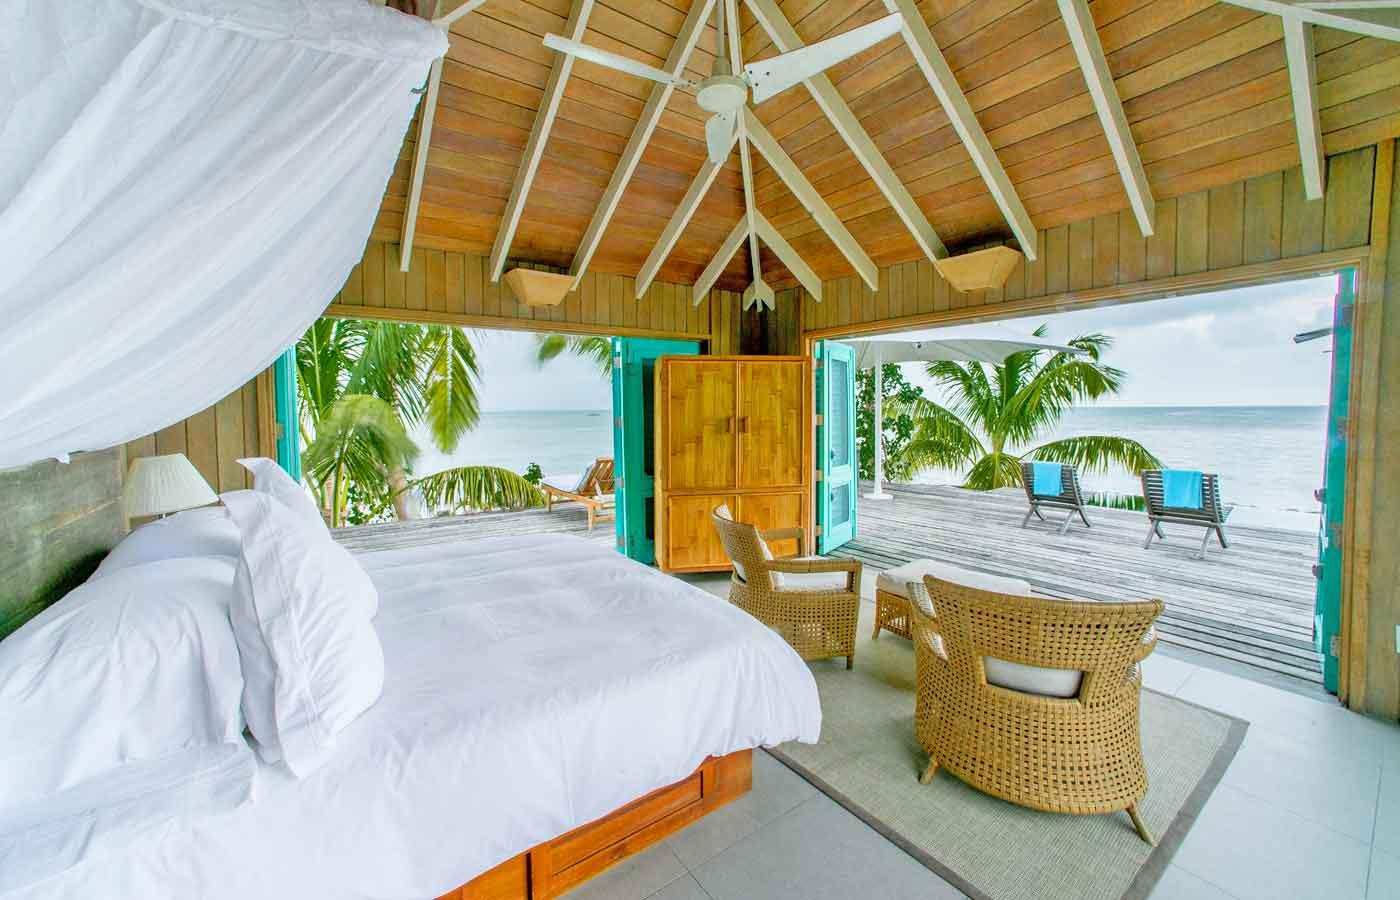 Cayo Espanto Private Island, Belize, luxury Belize, luxury holidays to Belize, tailor-made holidays to Belize, Belize luxury holidays